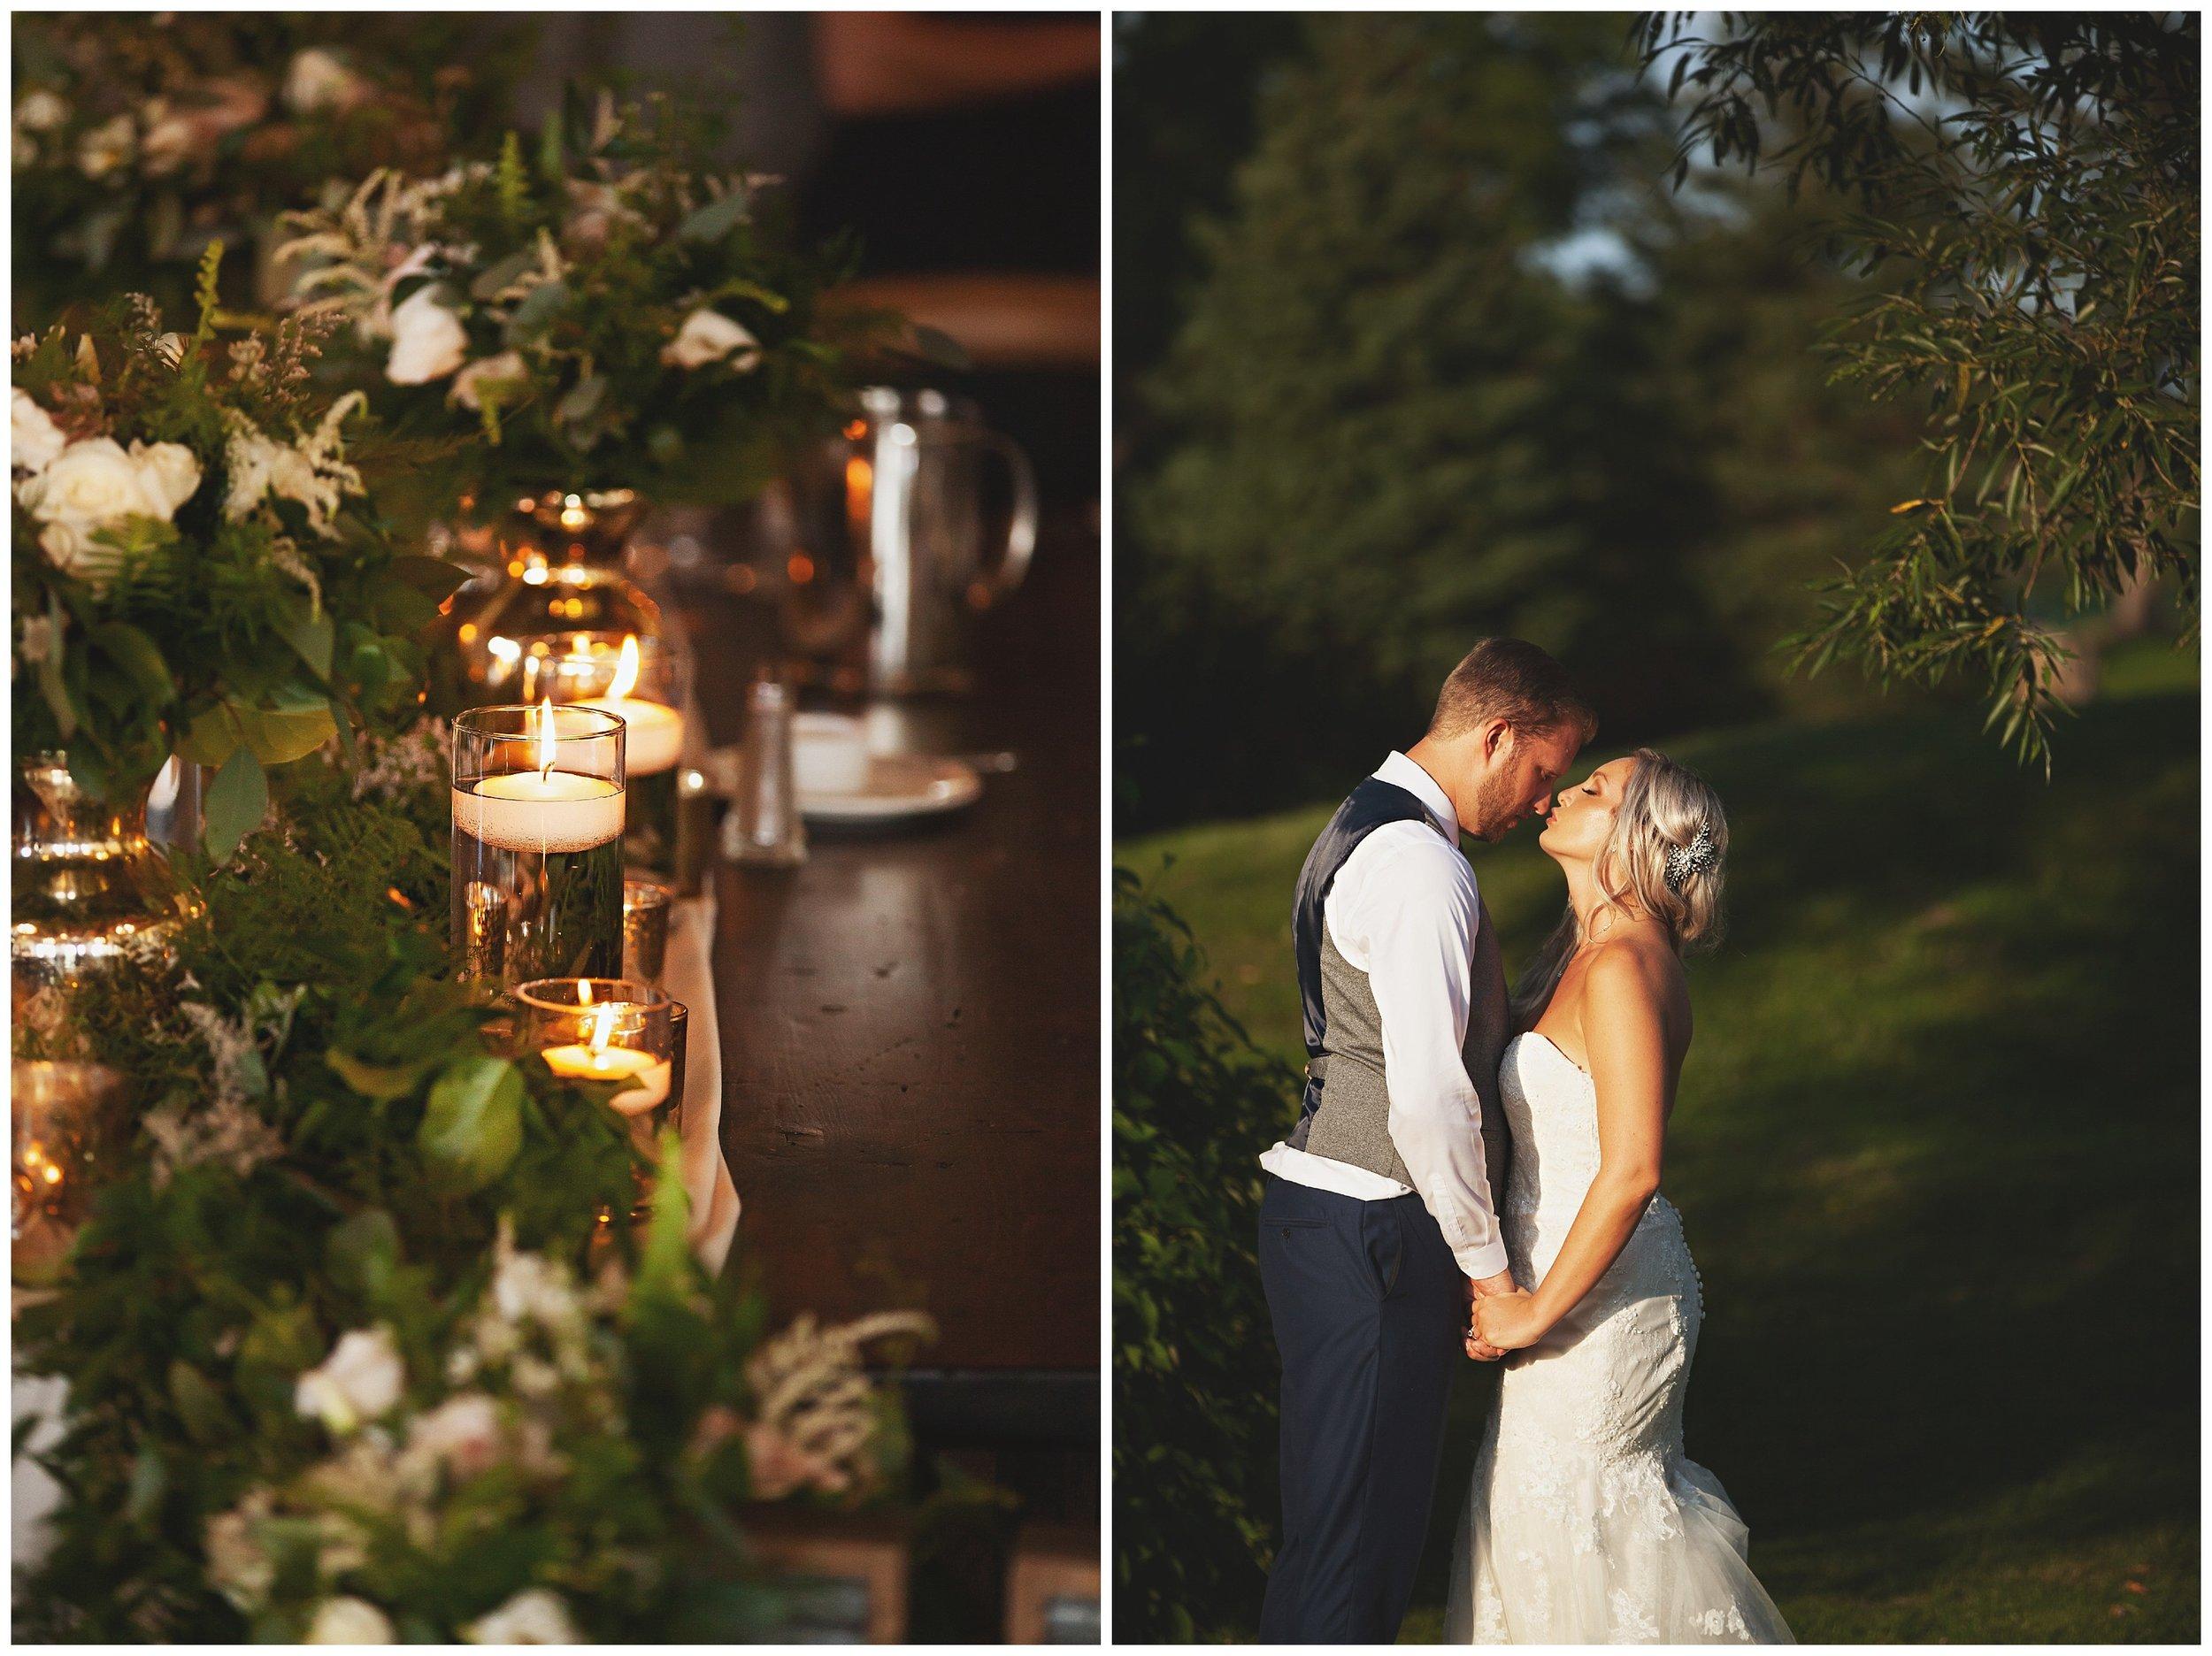 VanDaele-Russell-Wedding-Photography-London-Toronto-Ontario_0182.jpg